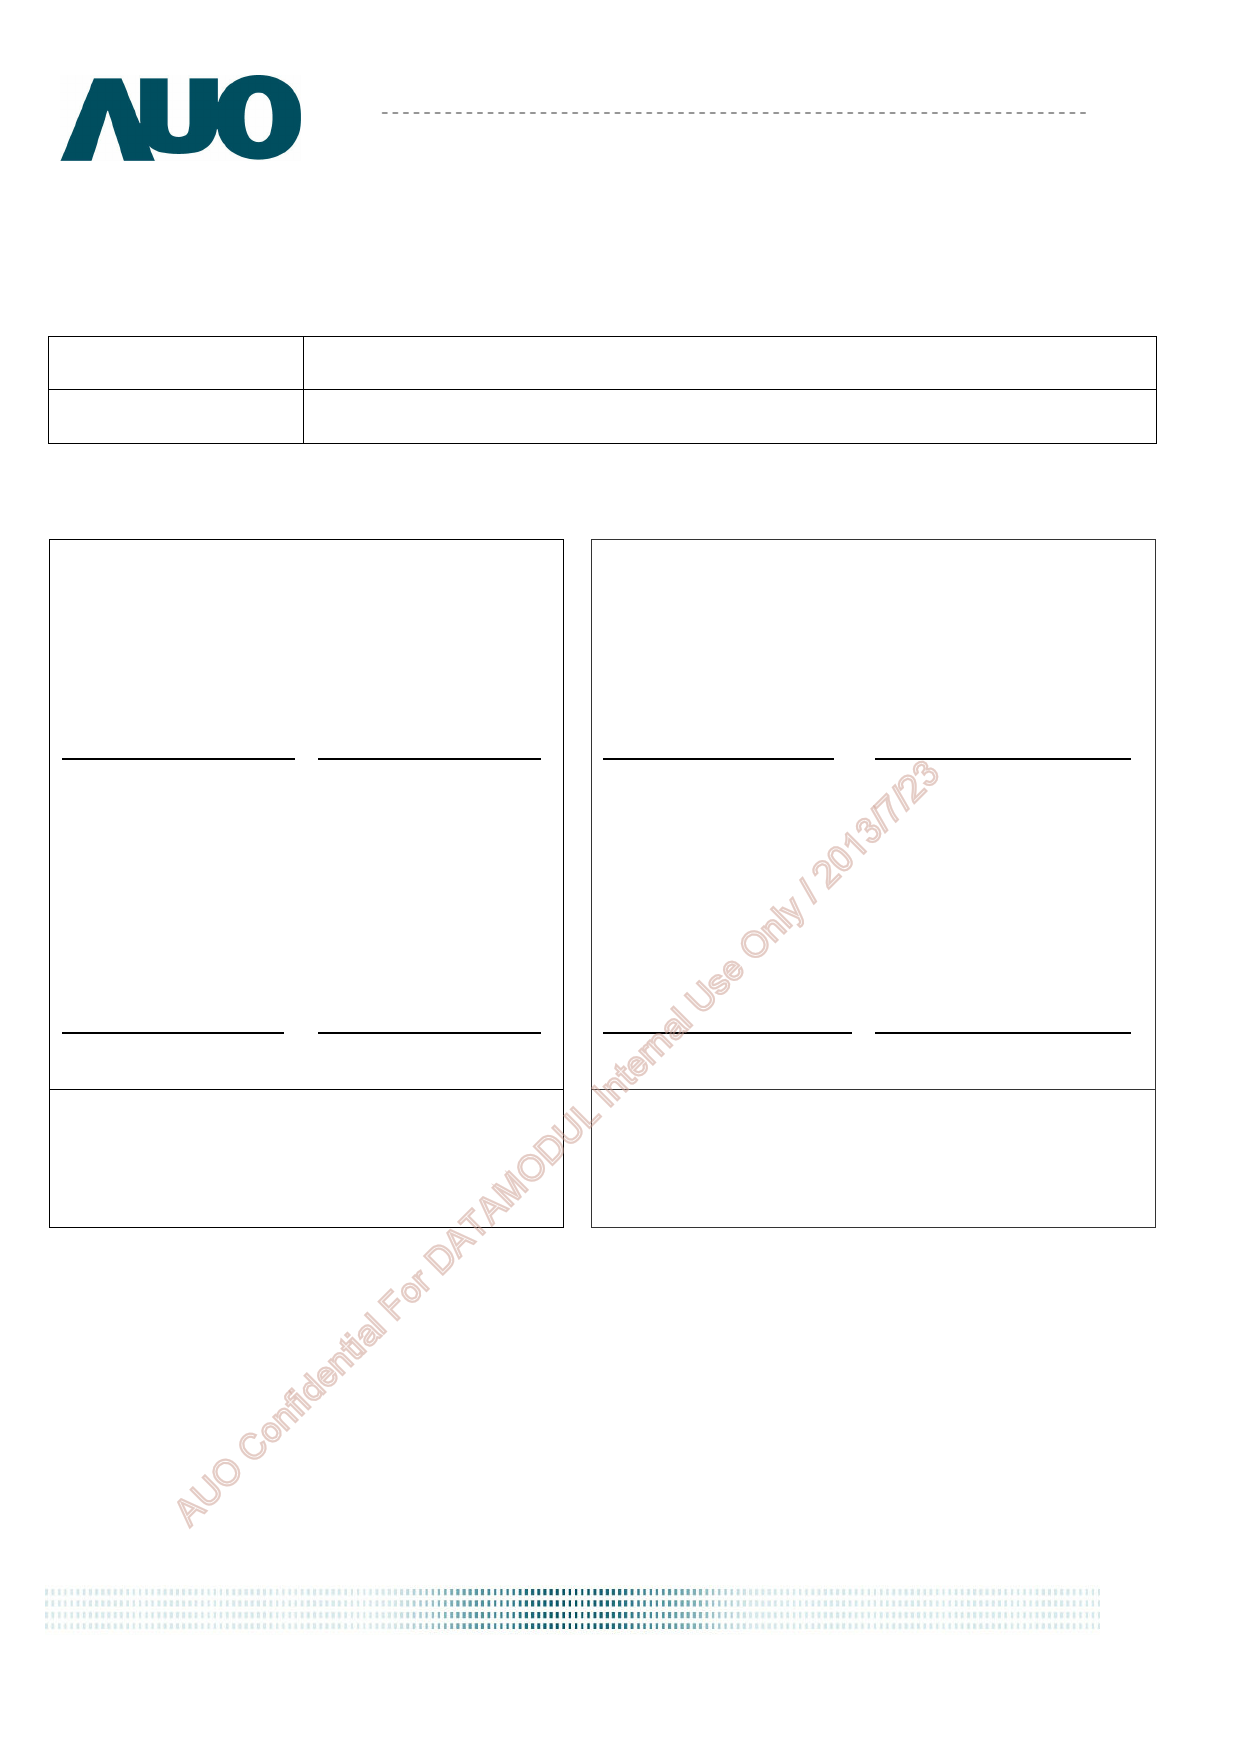 G057QN01-V2 Datasheet, G057QN01-V2 PDF,ピン配置, 機能